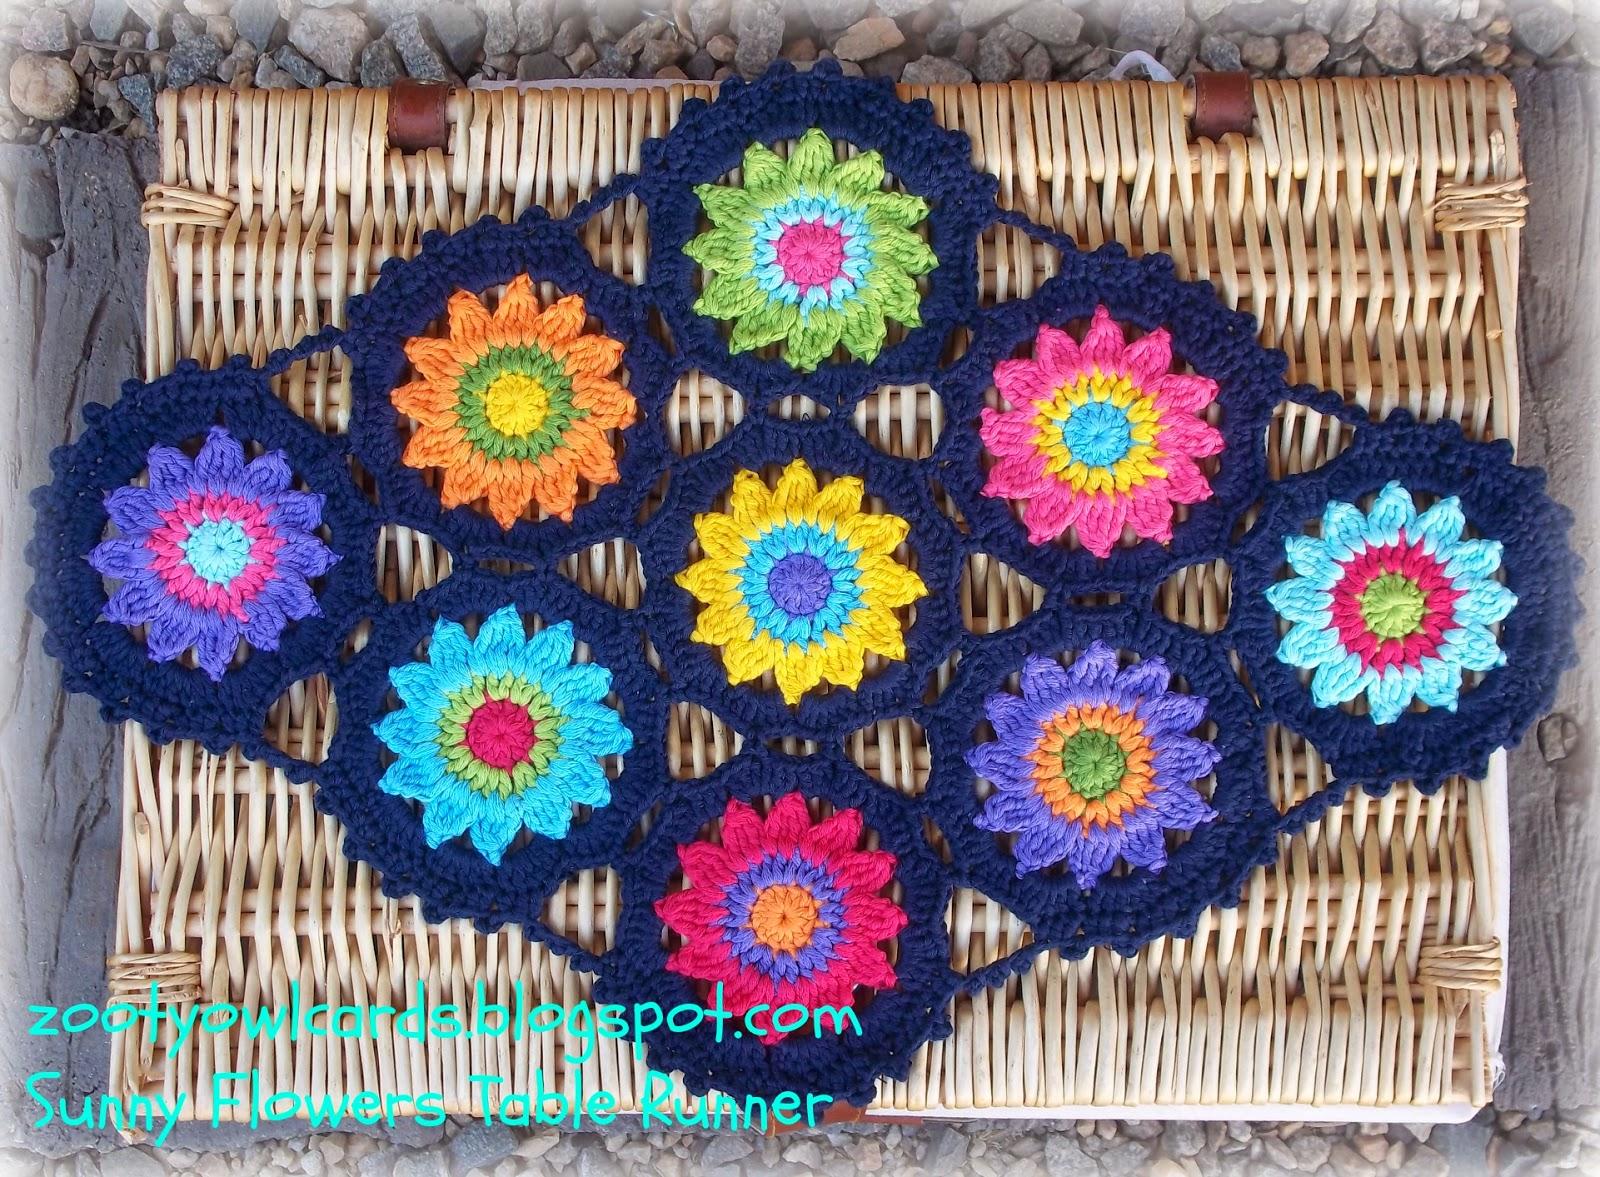 Zooty Owl\'s Crafty Blog: Sunny Flower Motif Table Runner